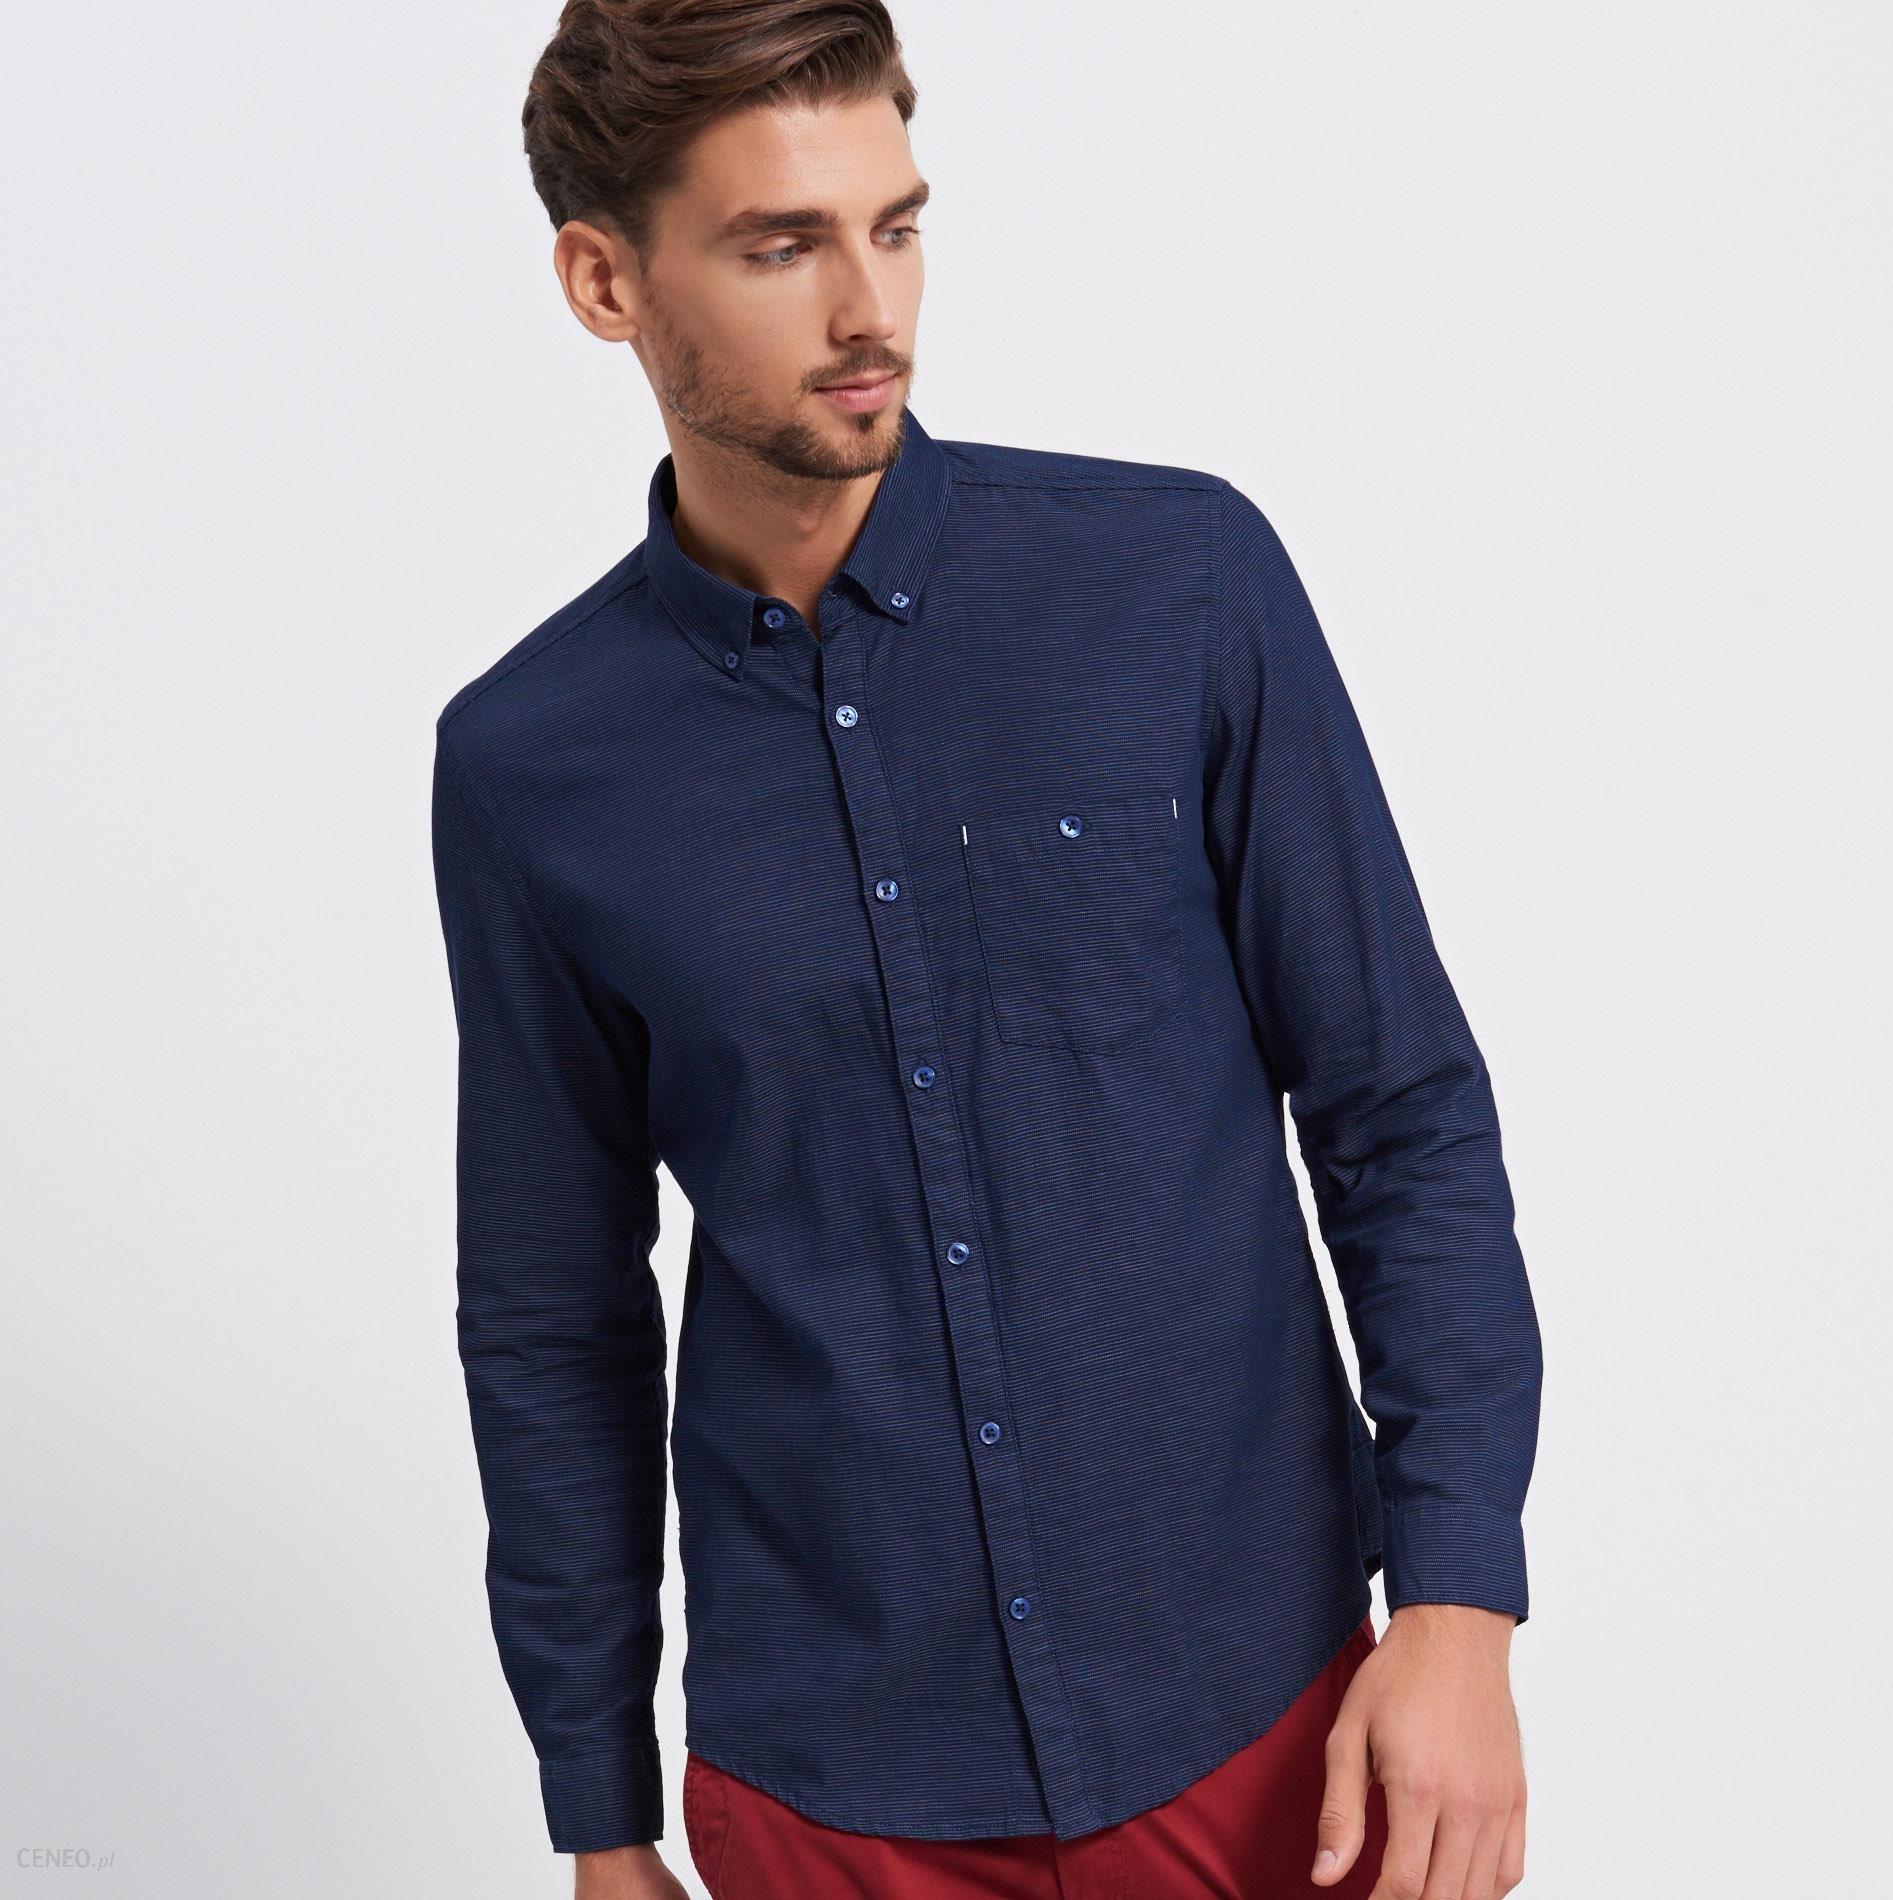 a3901fdc9415 Reserved - Koszula regular fit - Granatowy - męska - Ceny i opinie ...